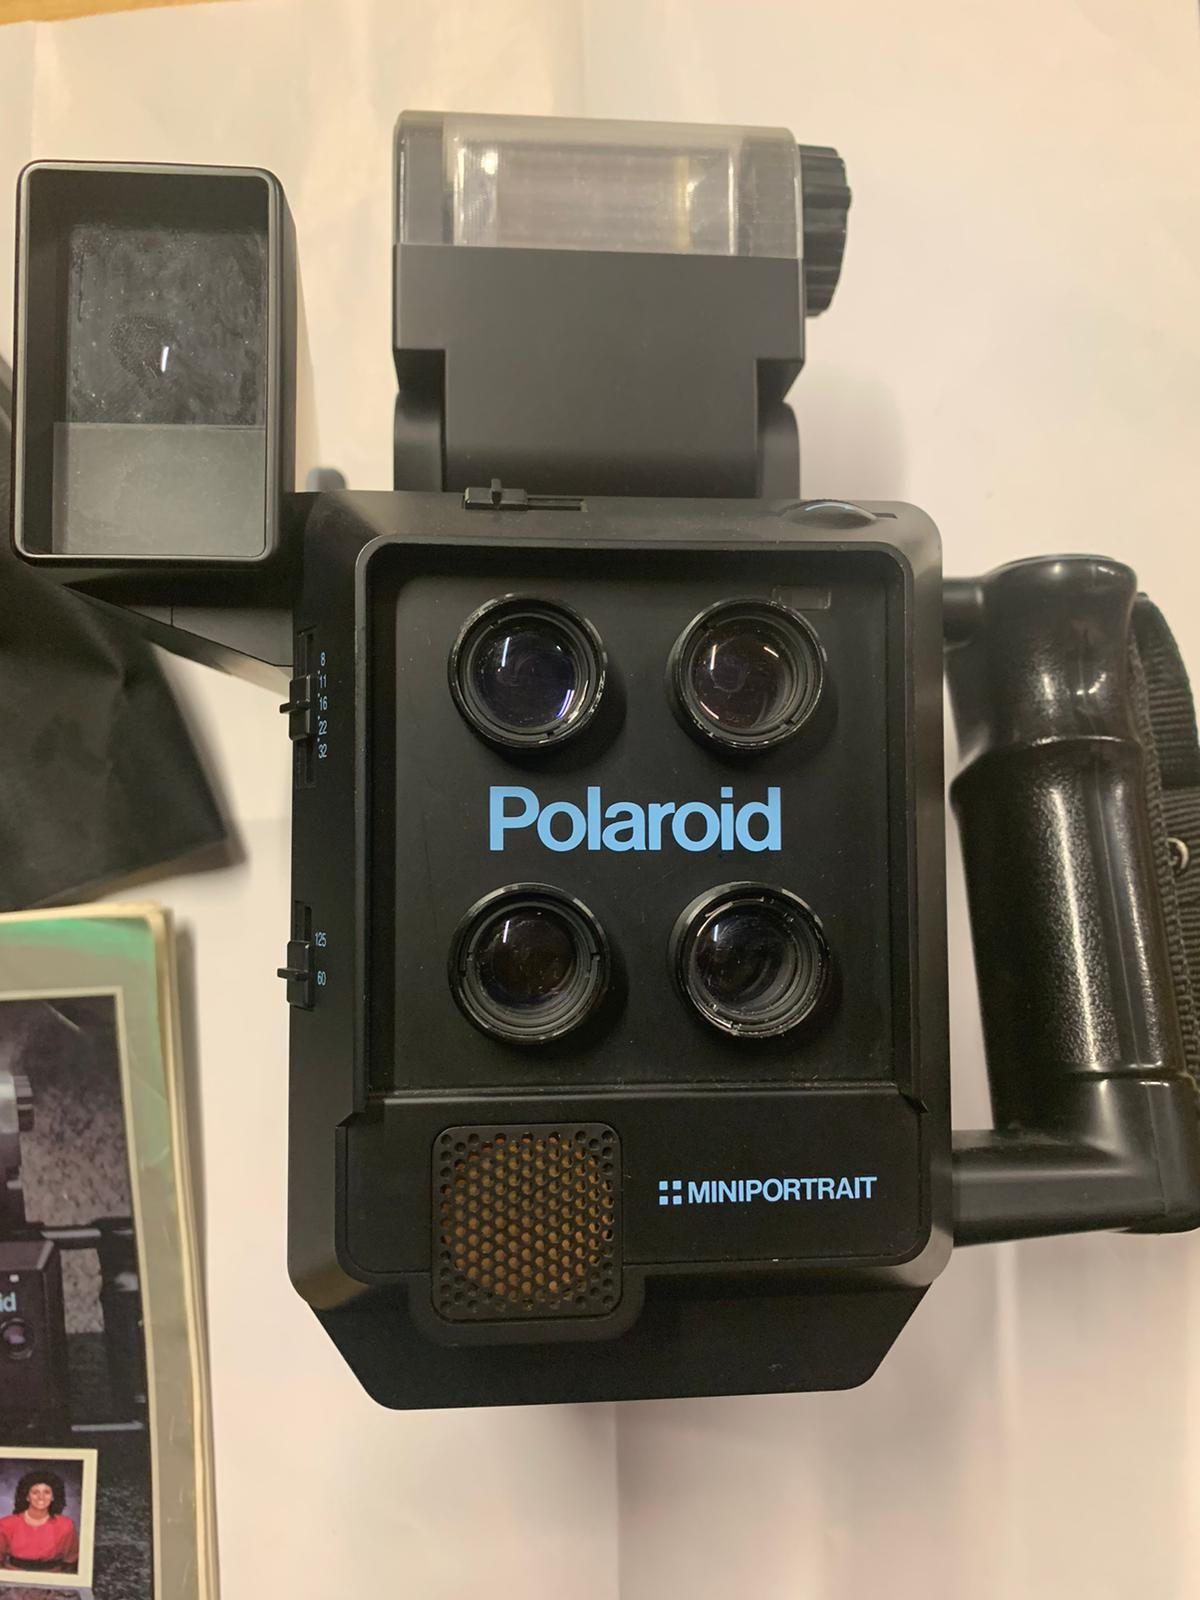 Polaroid miniportrait, modello 403